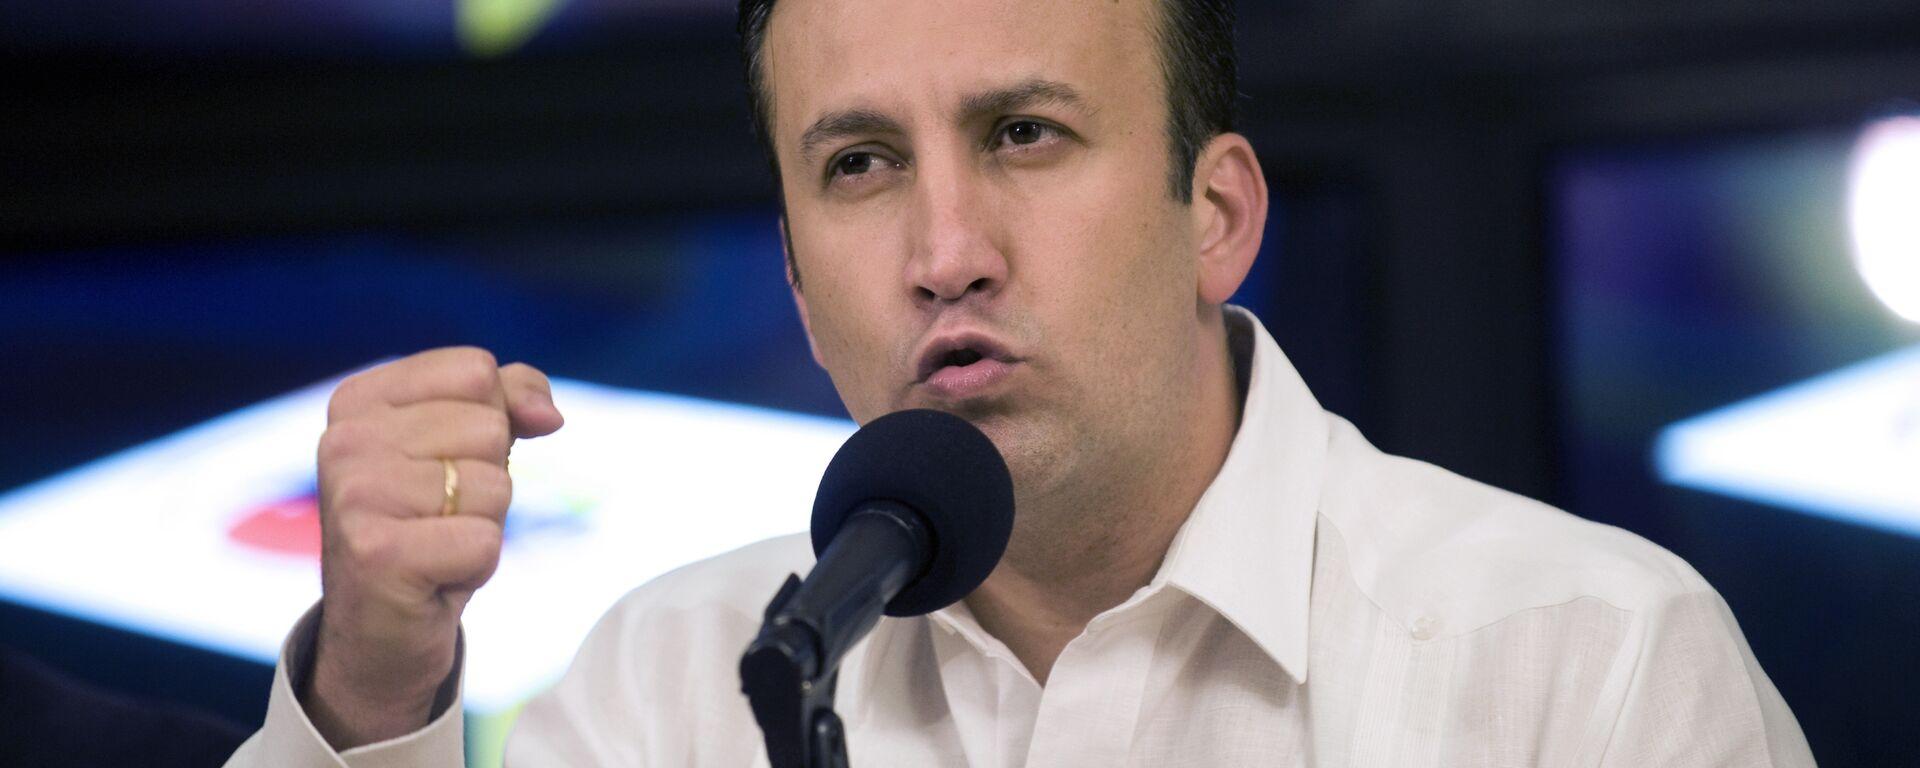 Venezuelan Interior Minister Tarek El Aissami delivers a press conference in Caracas on April 10, 2012 - Sputnik Mundo, 1920, 30.03.2021